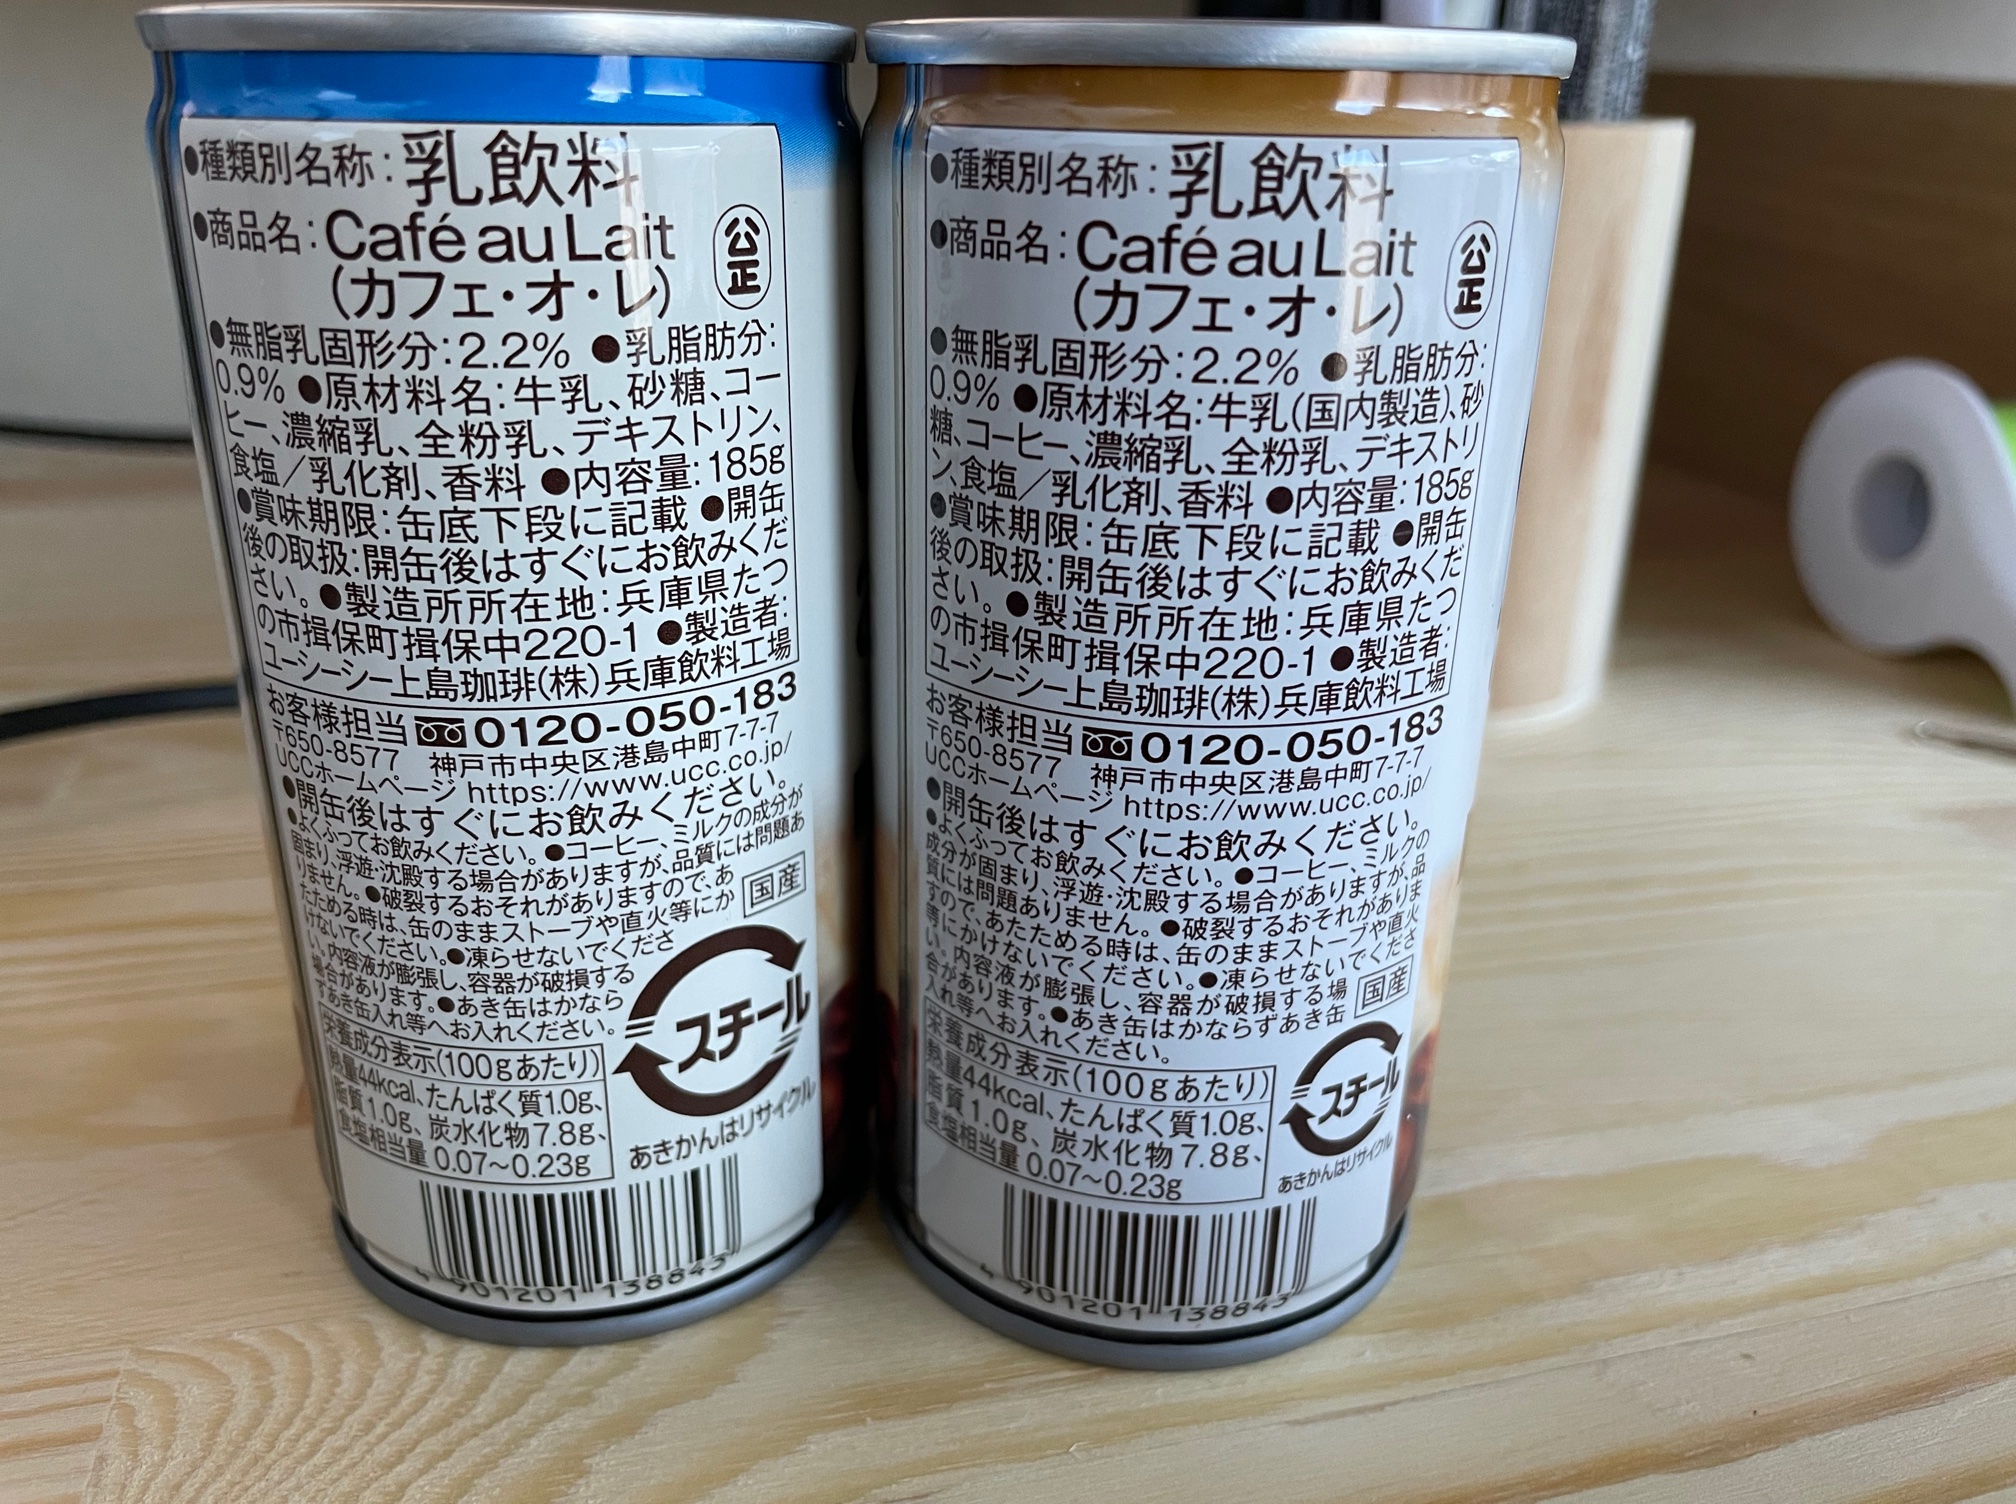 UCC カフェ・オ・レ 青と茶比較 裏面